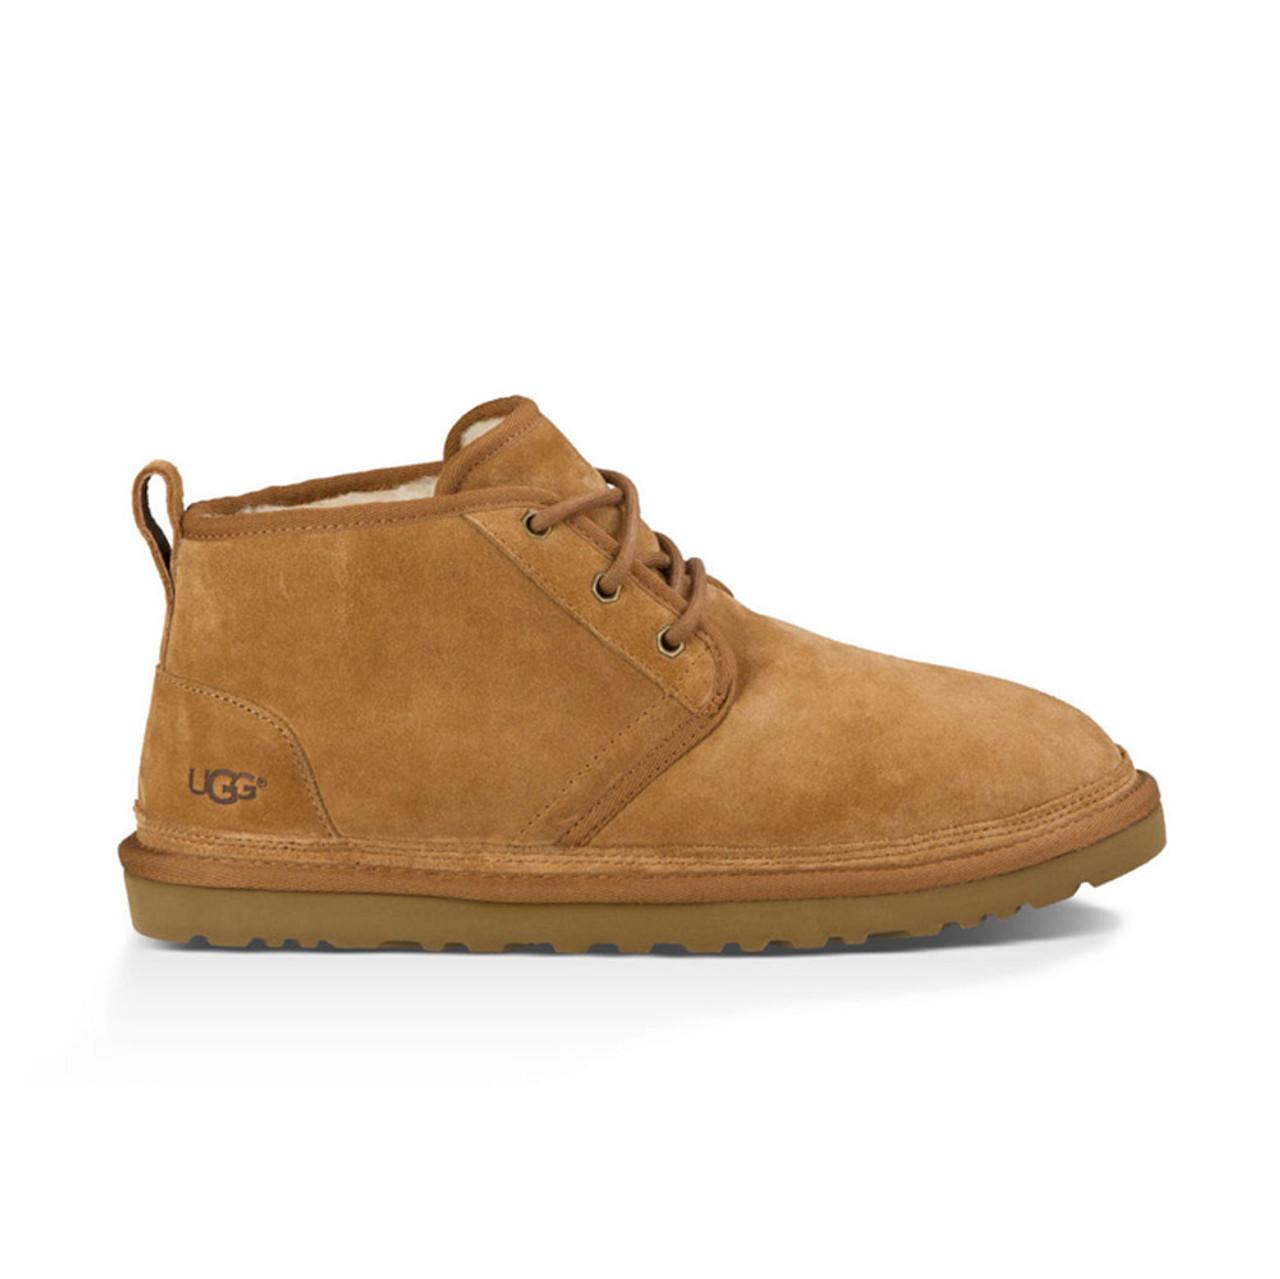 c137bf44968 UGG Men's Neumel Boot Chestnut